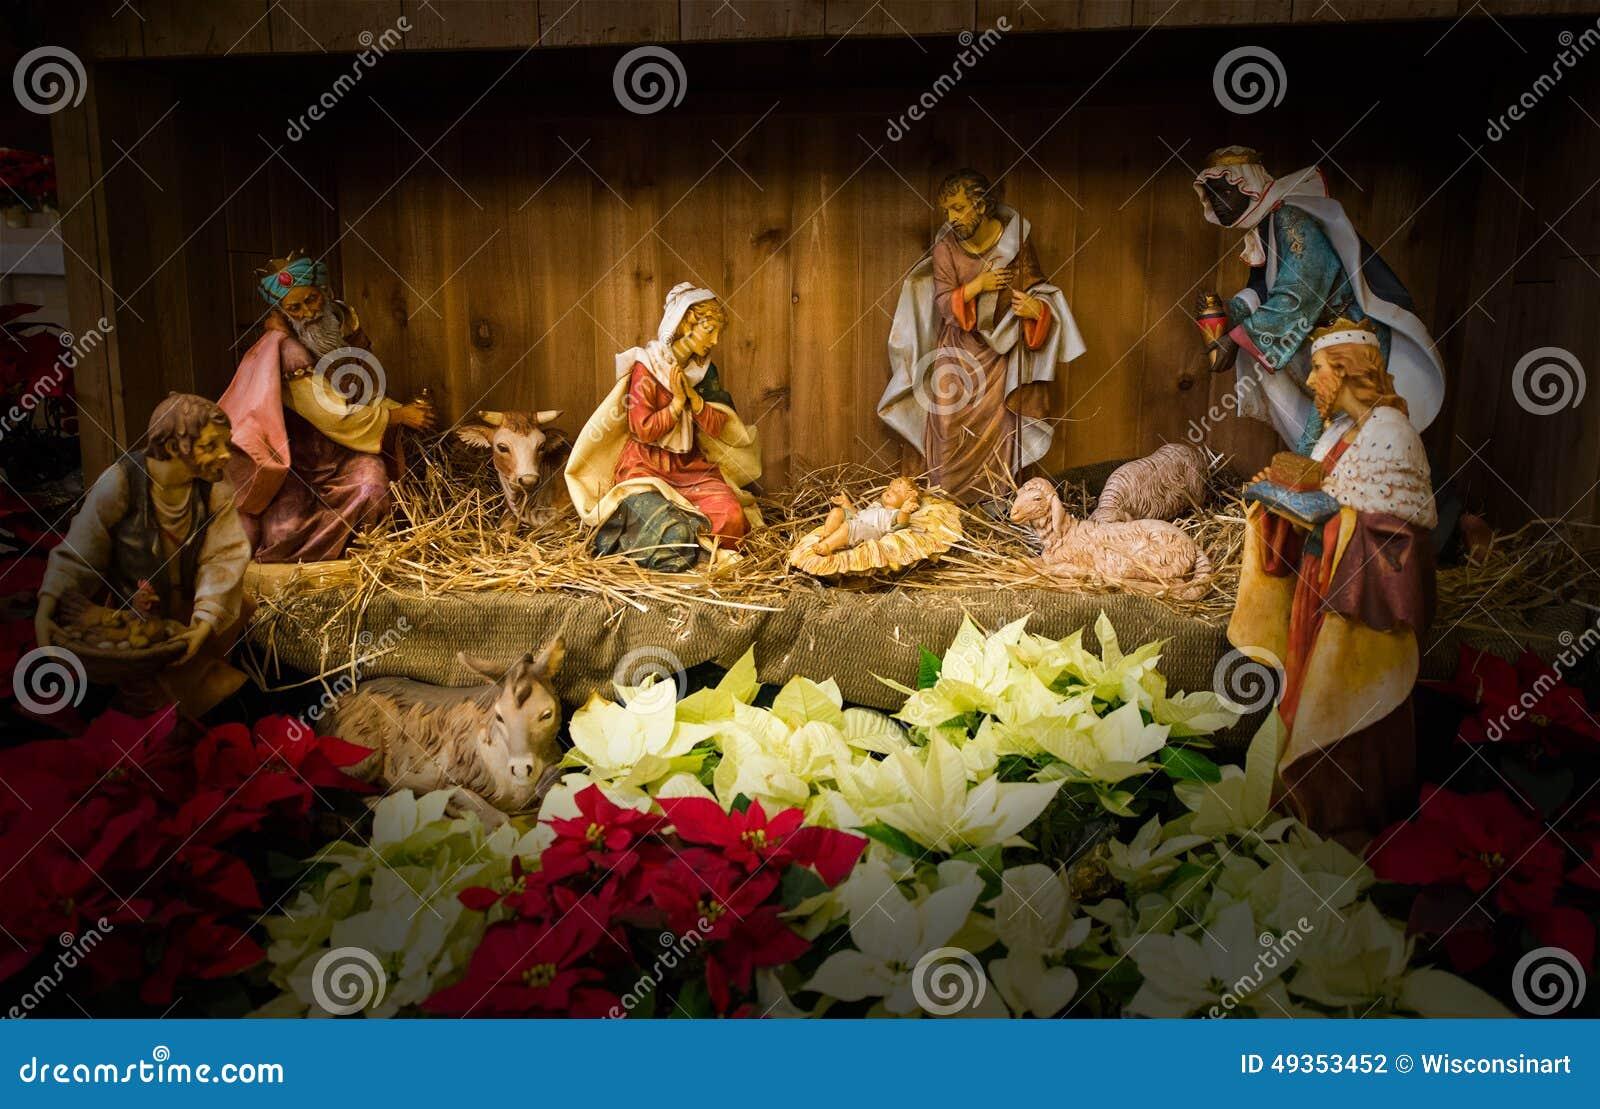 Baby Jesus Christmas Nativity Scene Stock Photo - Image of jesus ...